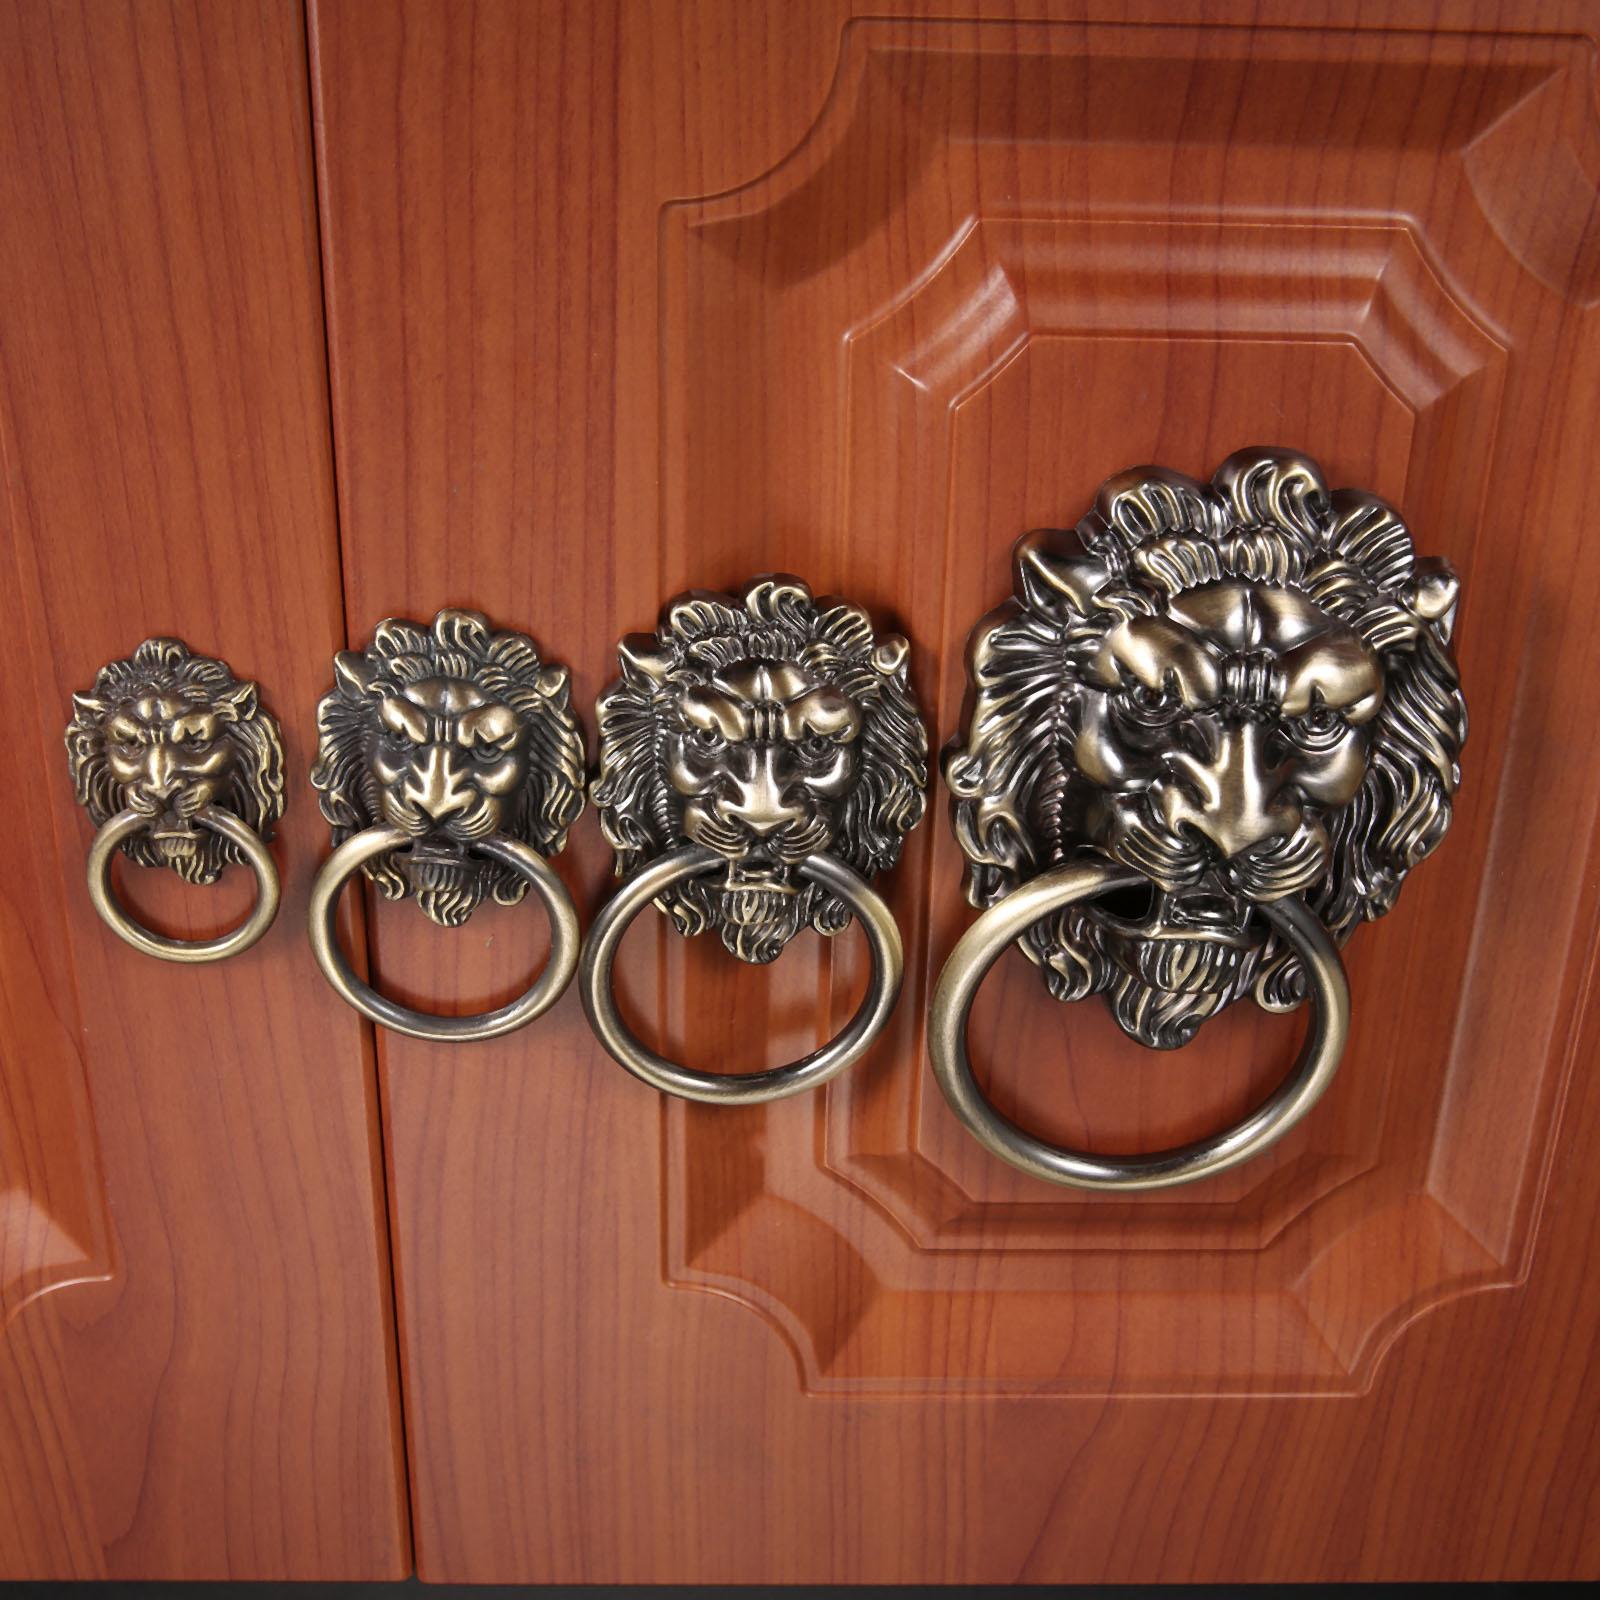 DRELD Vintage Lion Head Cabinet Knobs and Handles Furniture Door Antique Furniture Handles Cabinet Drawer Pull Handle Knob Ring